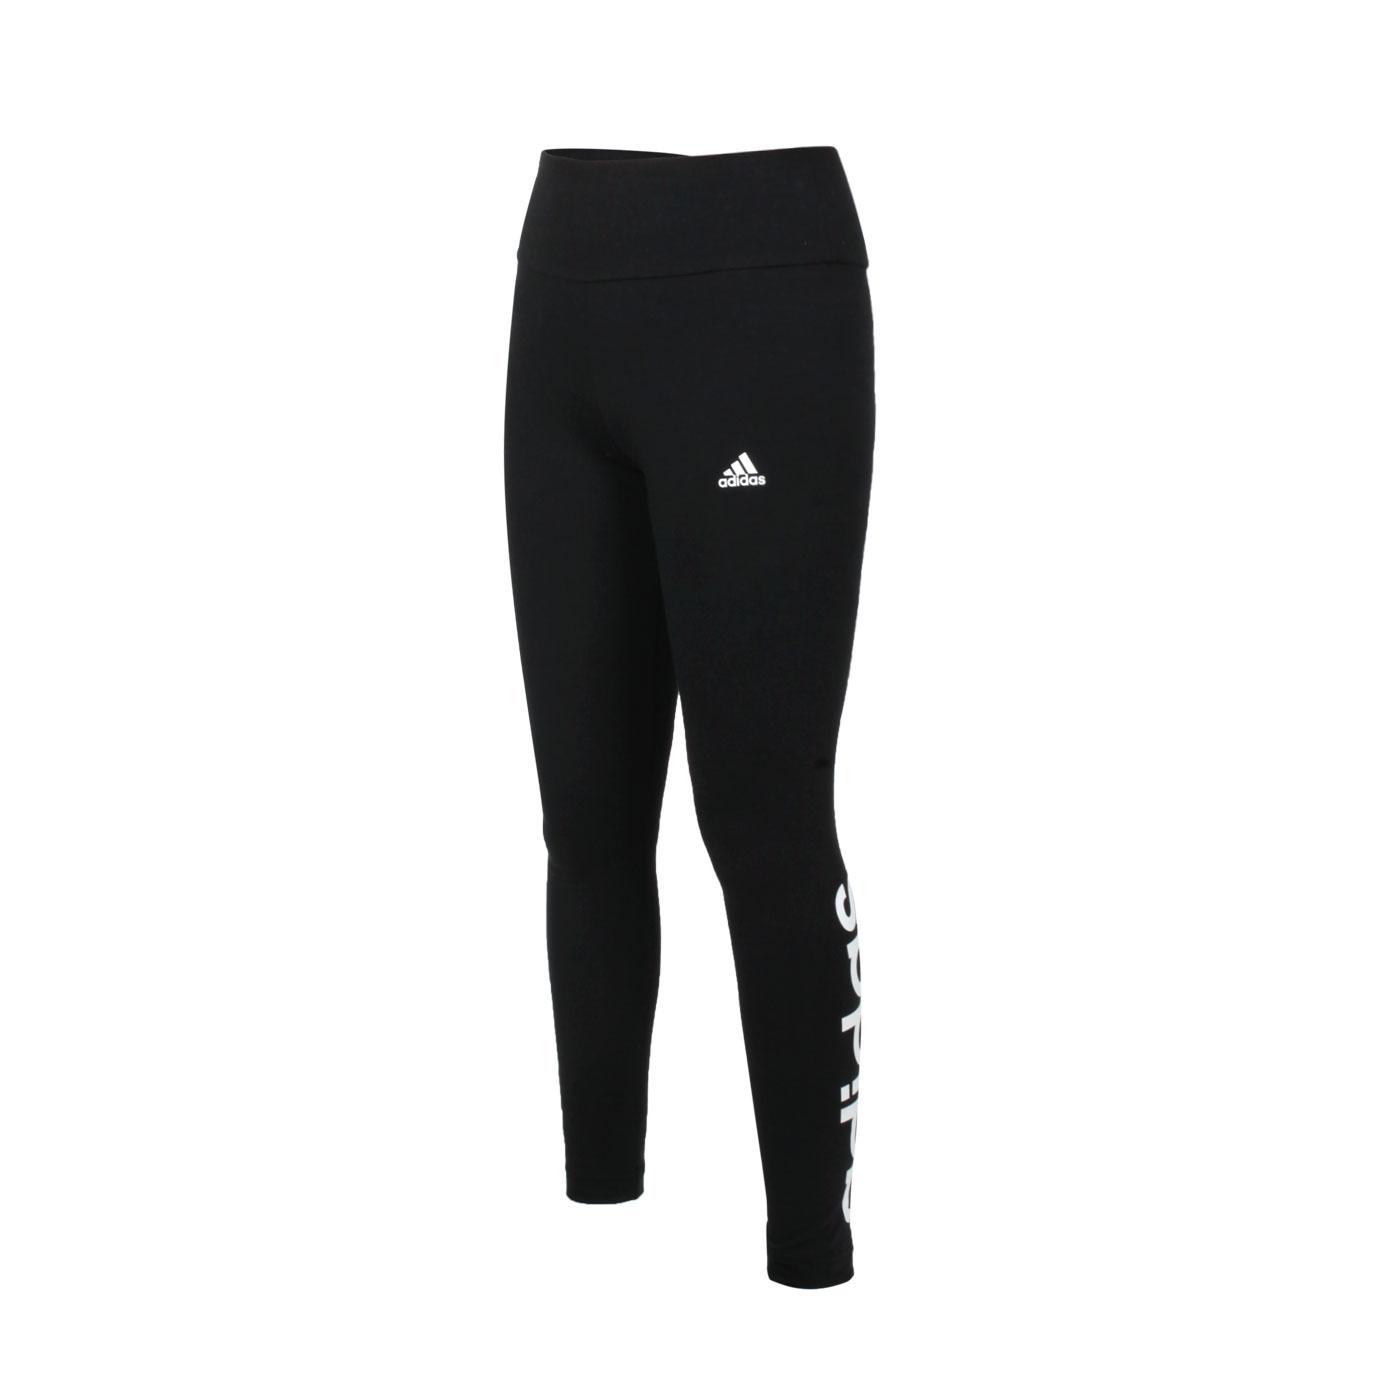 ADIDAS 女款緊身長褲 GL0633 - 黑白